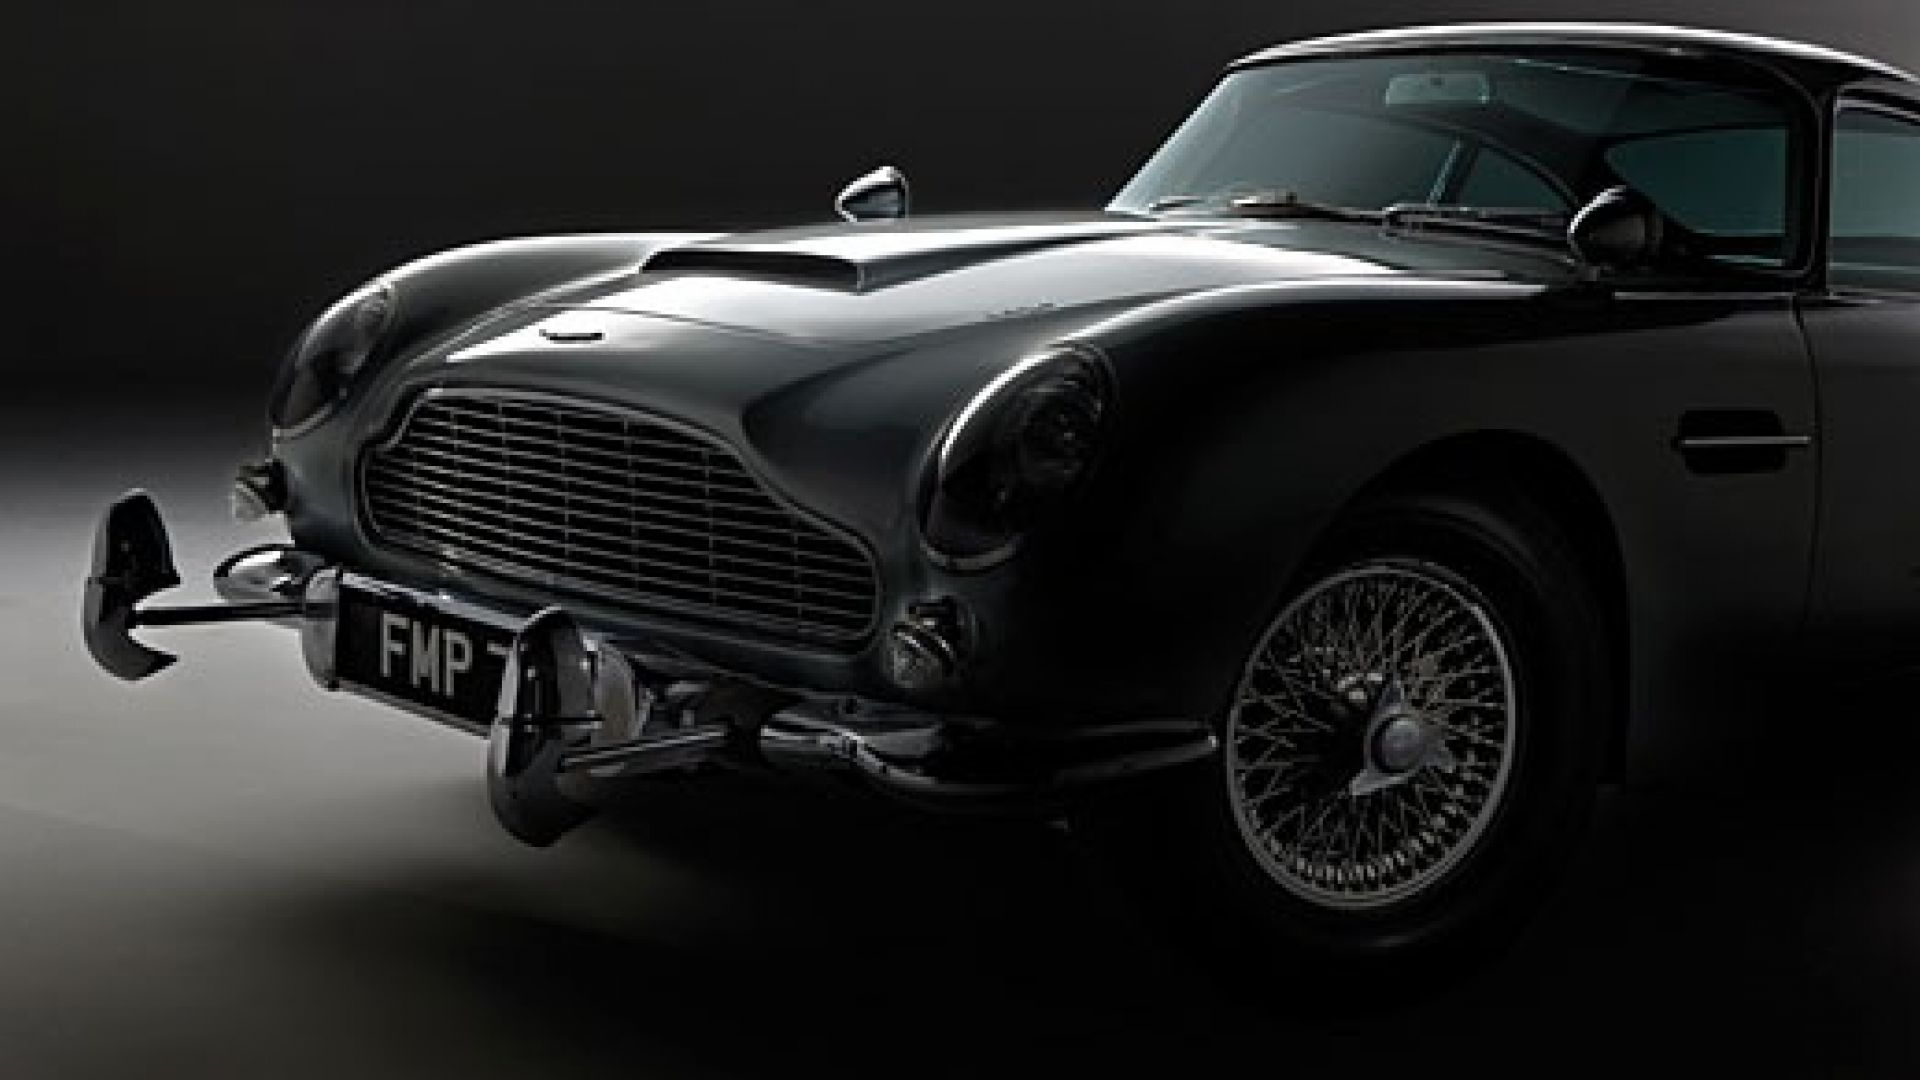 vehicles bond lifestyle - HD1572×1048